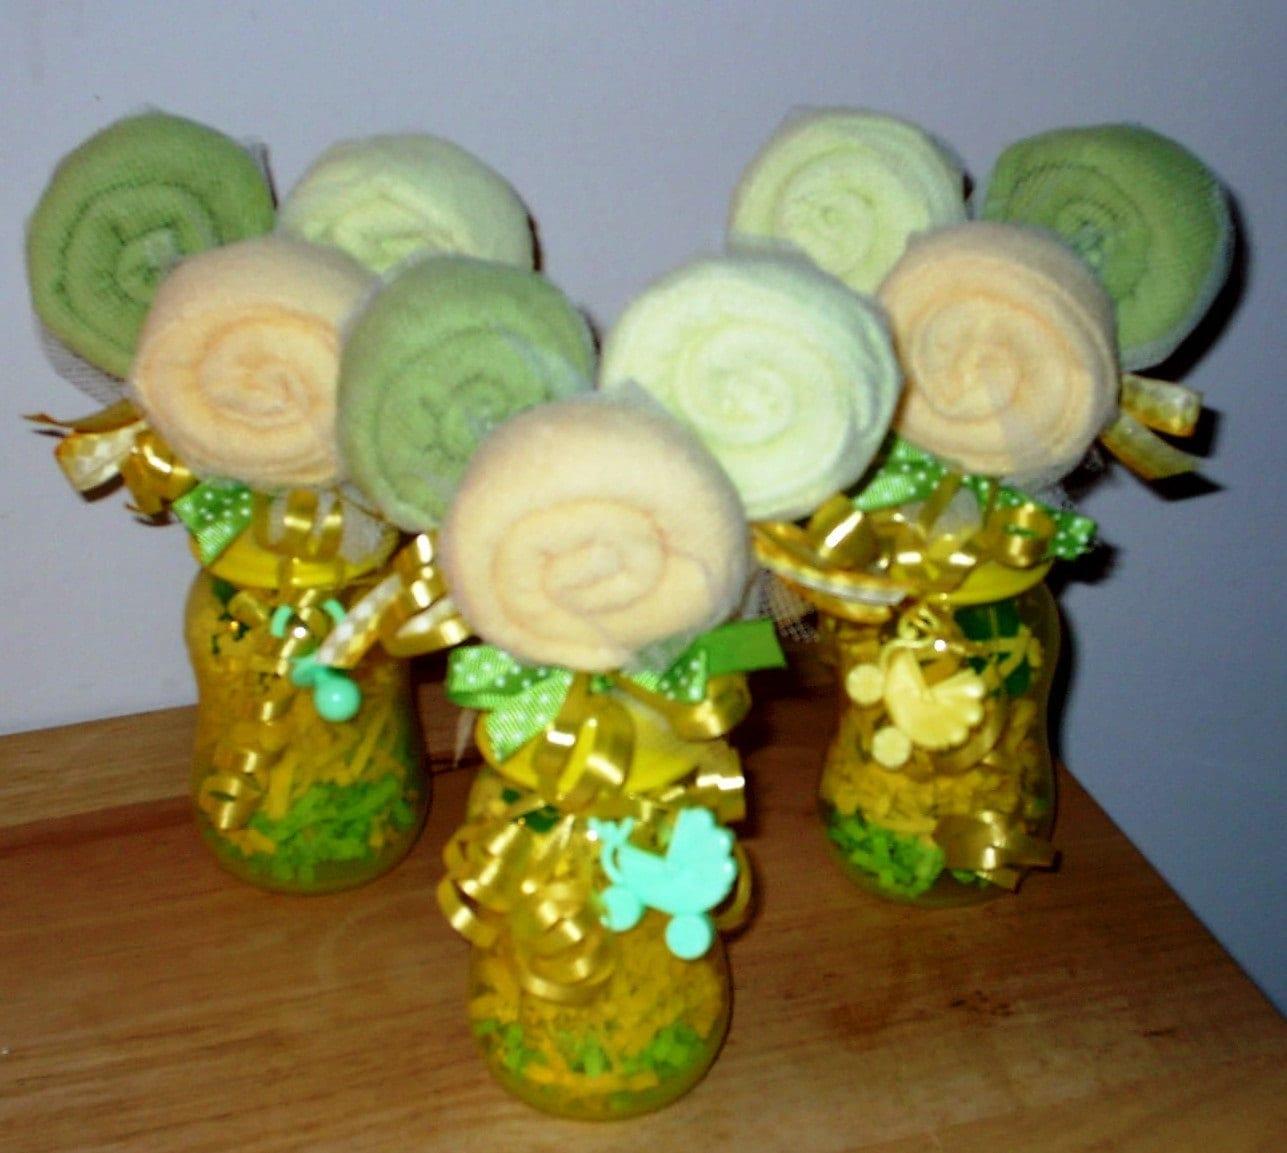 So sweet baby washcloth lollipop spoon and bottle vase